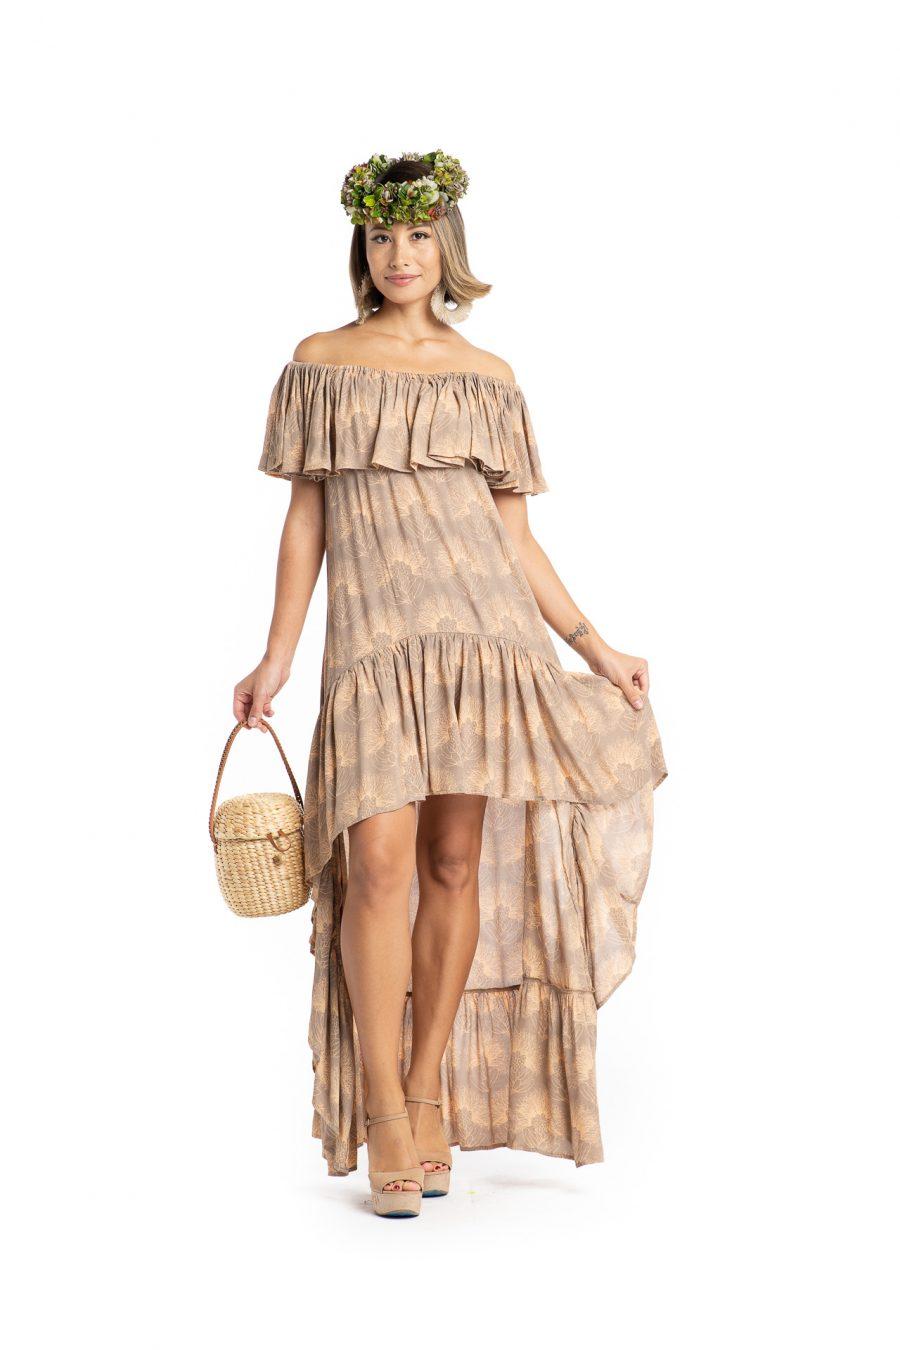 Model wearing Hauoli Long Dress in Kalihilehua Pattern - Front View